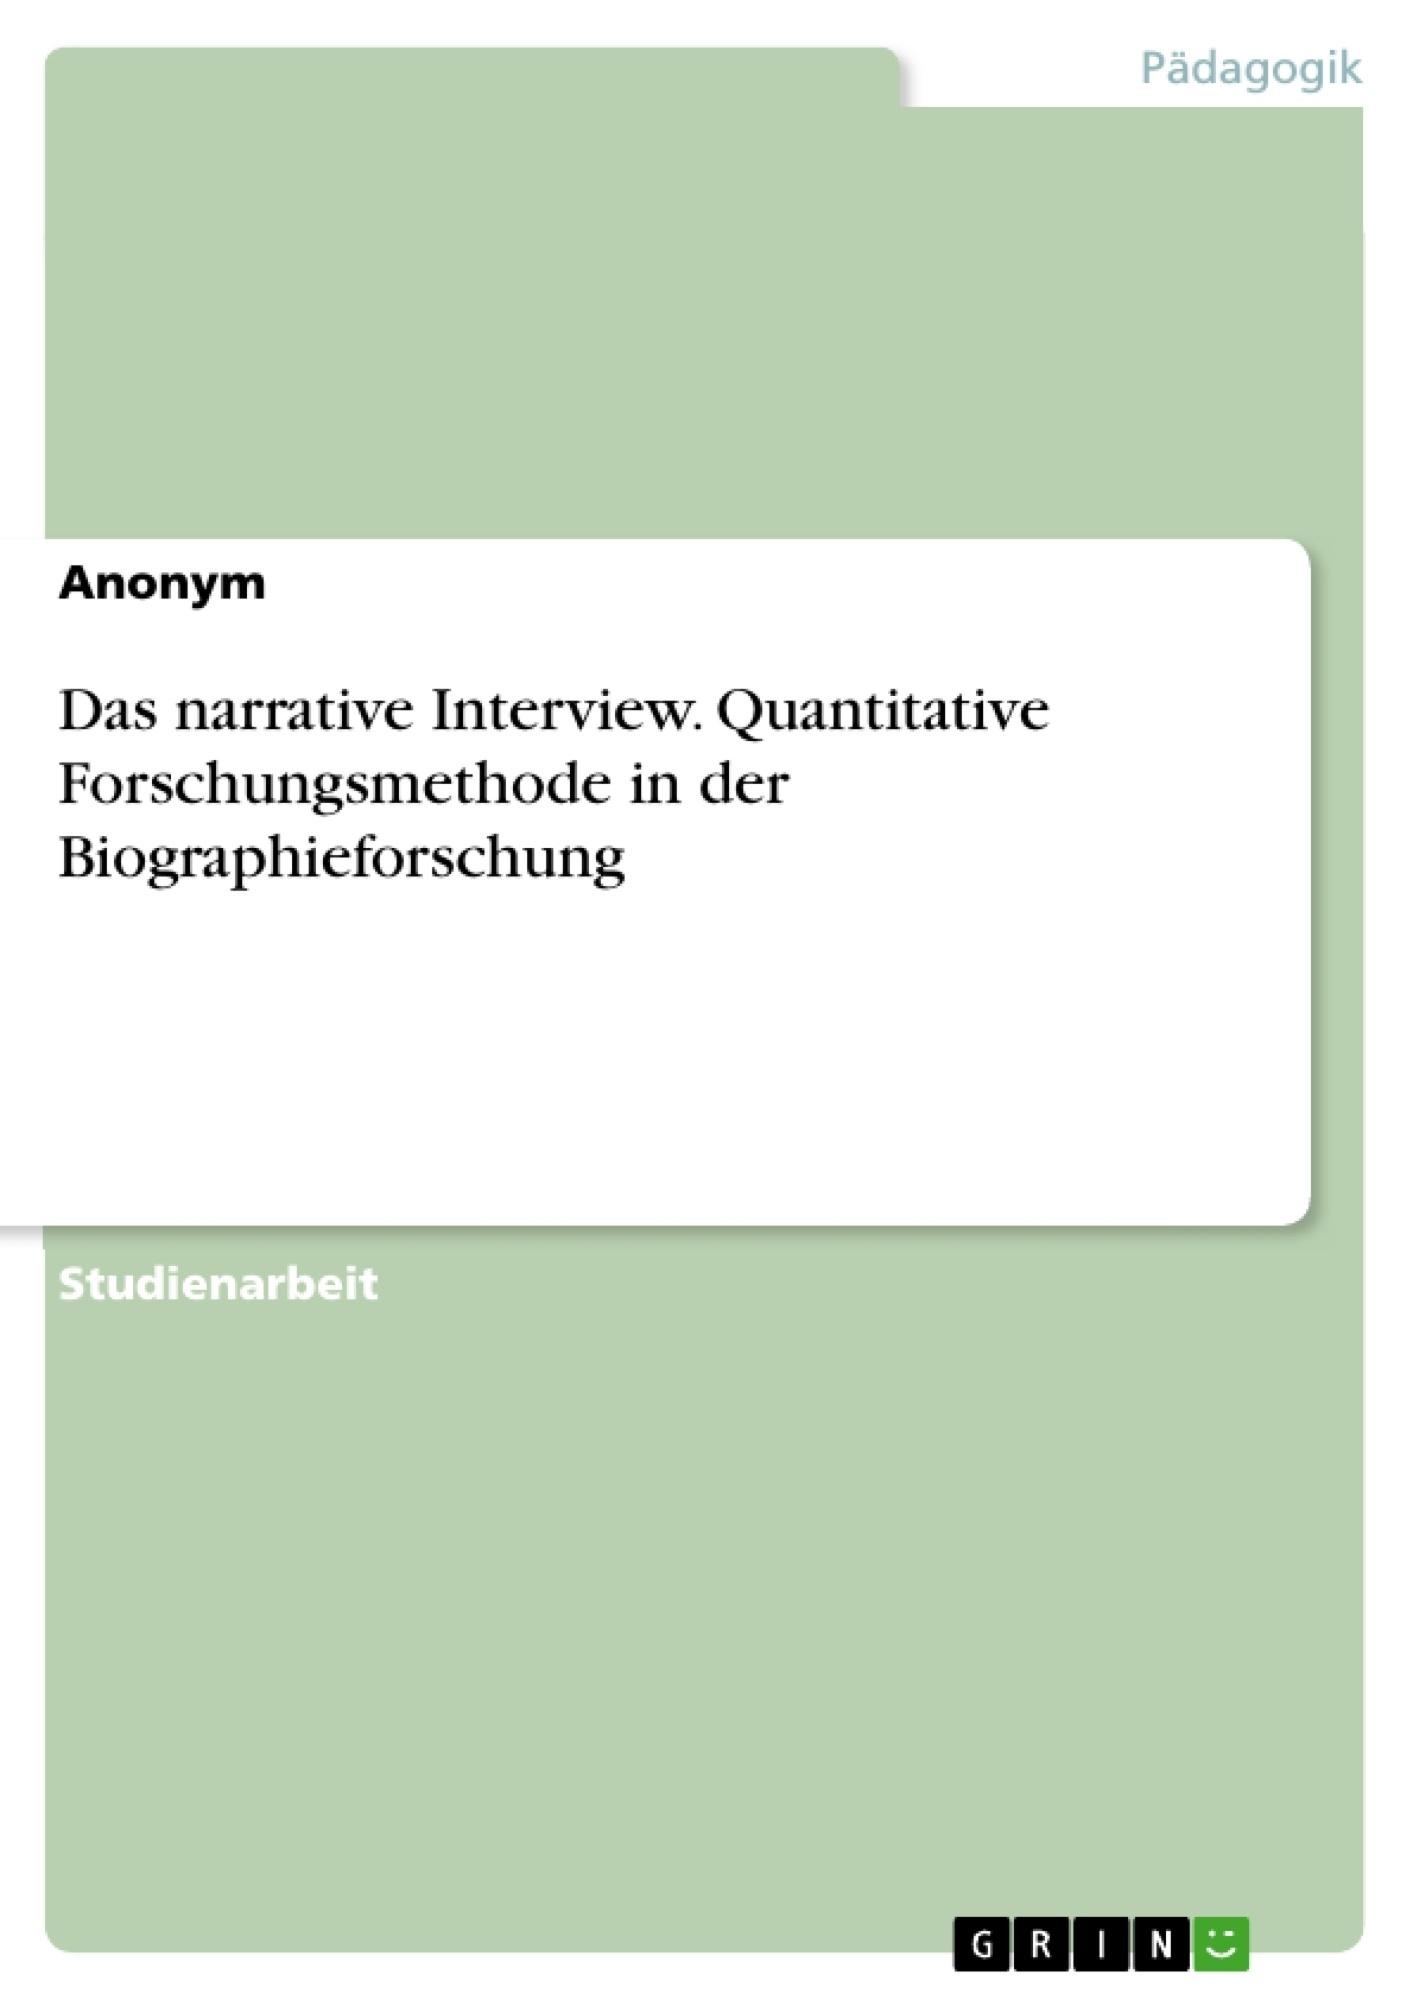 Titel: Das narrative Interview. Quantitative Forschungsmethode in der Biographieforschung